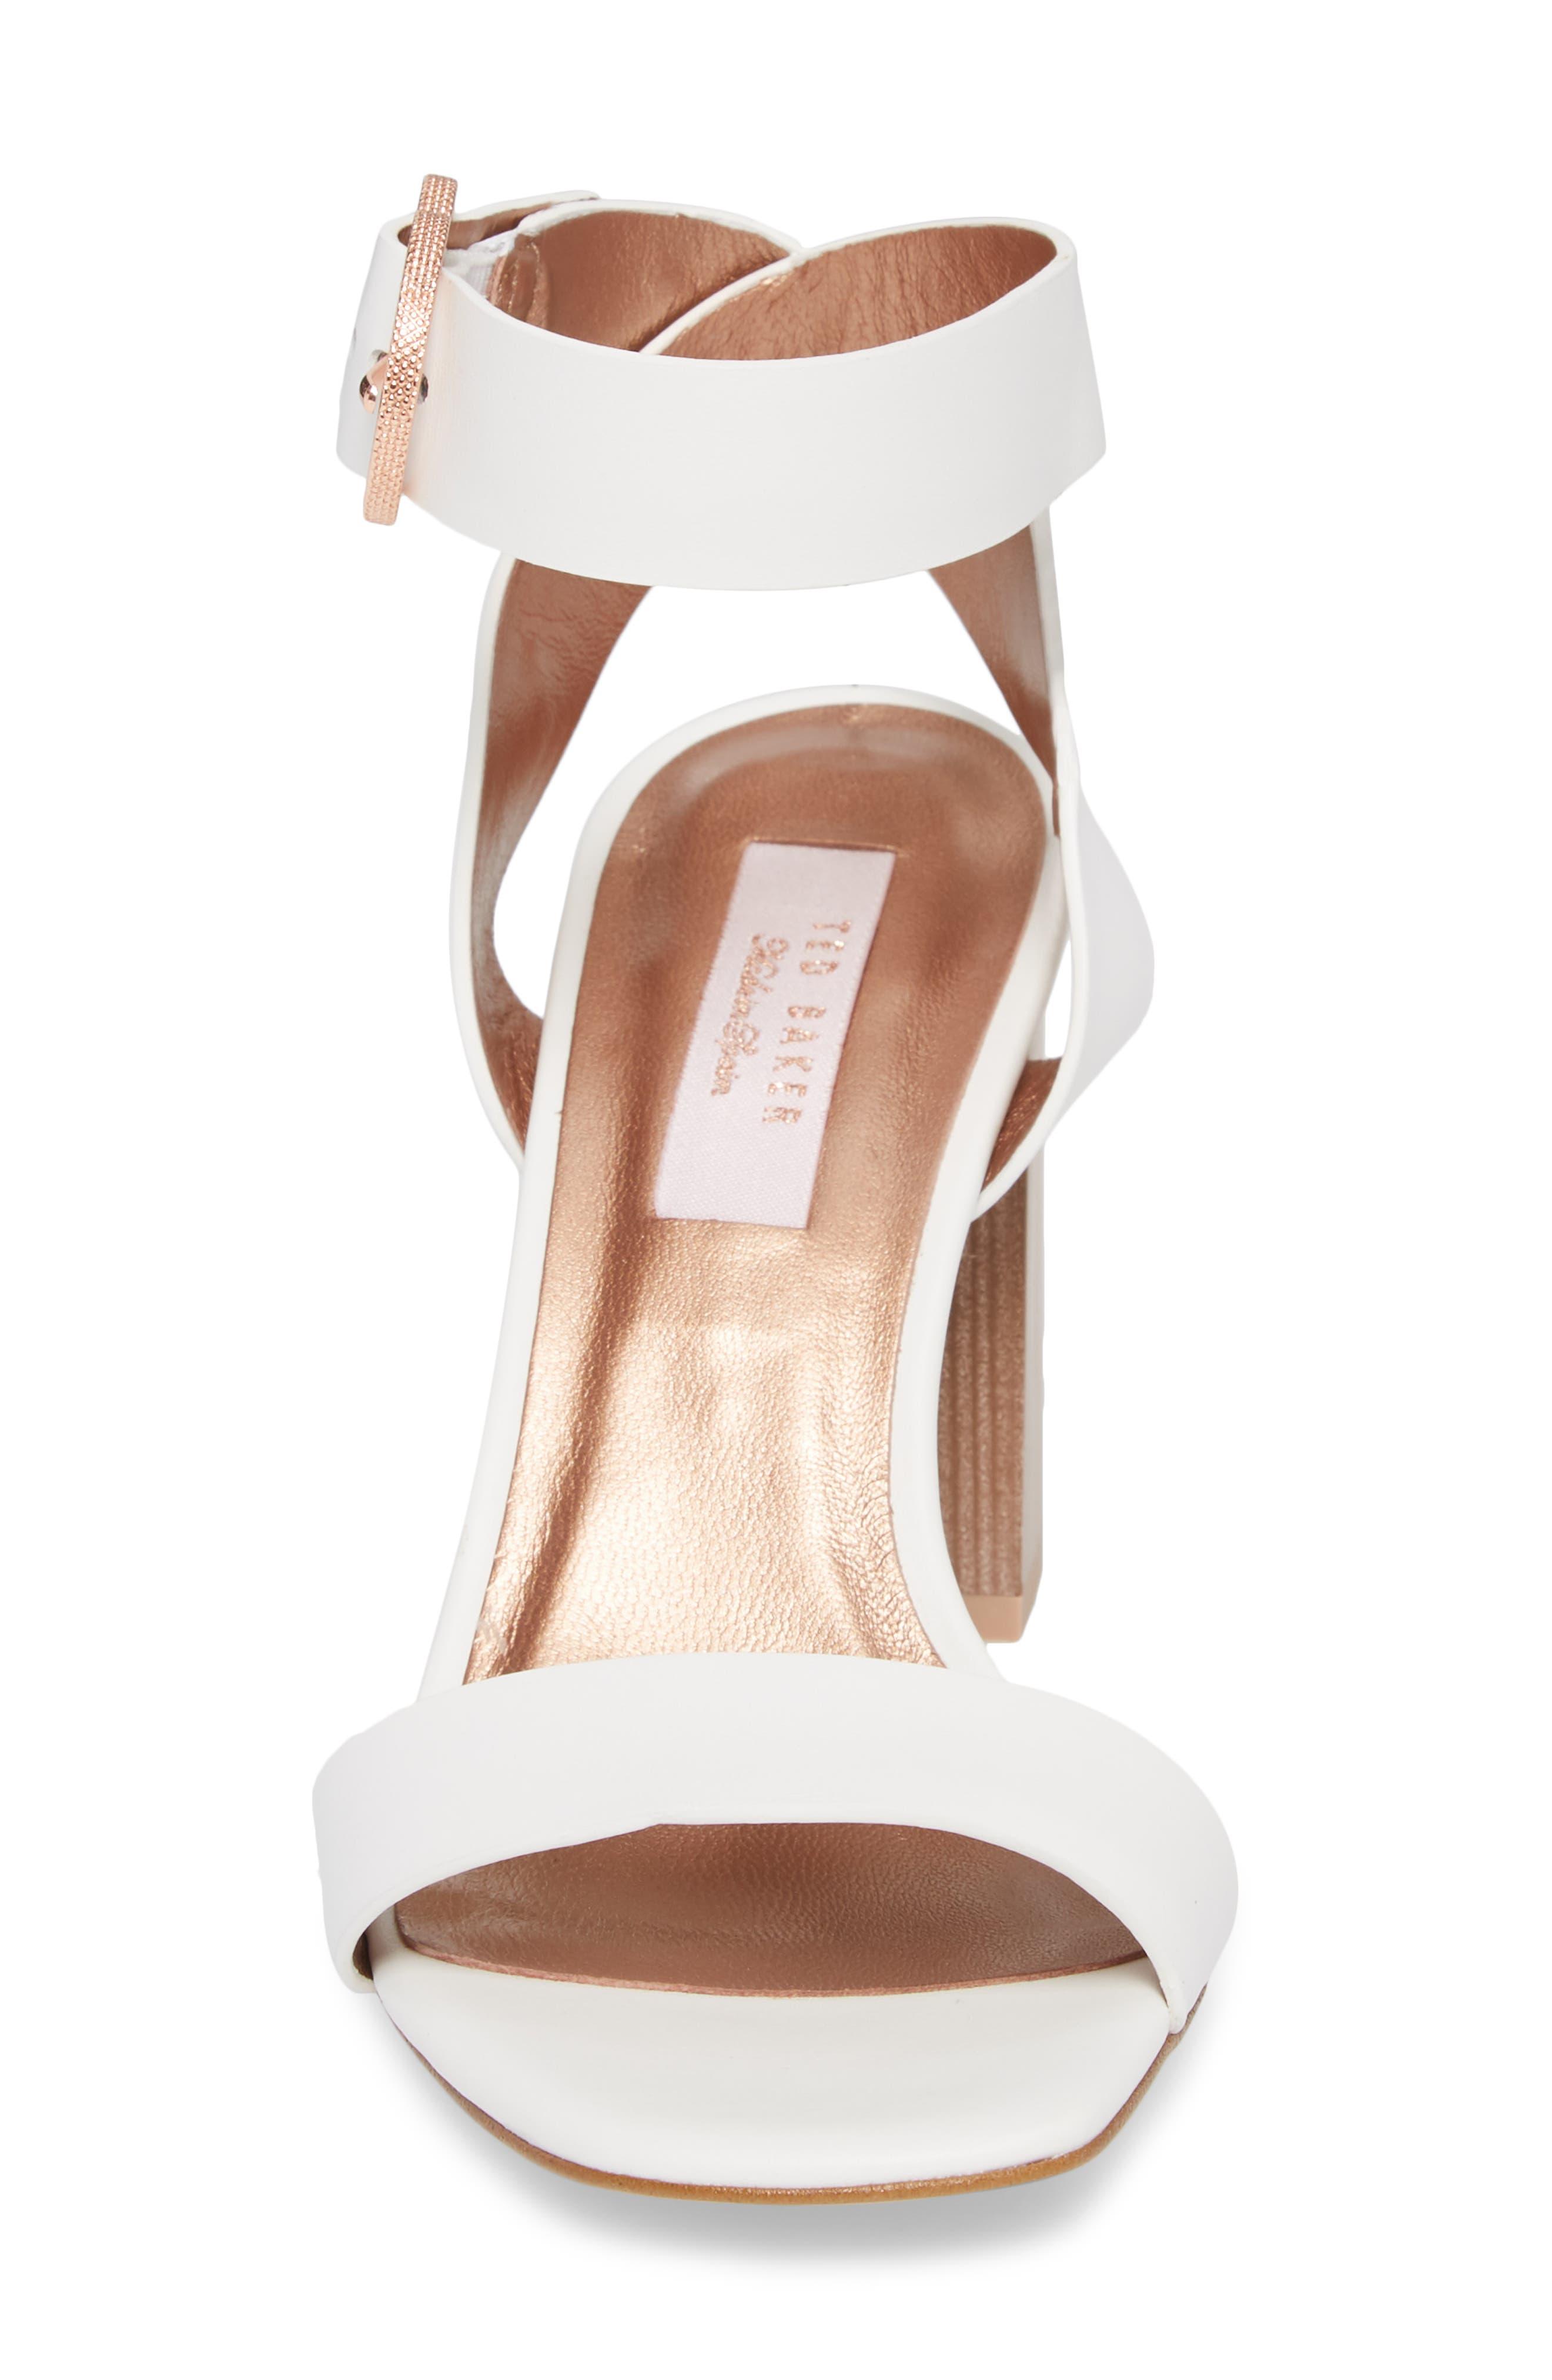 Vallama Block Heel Sandal,                             Alternate thumbnail 4, color,                             White Leather